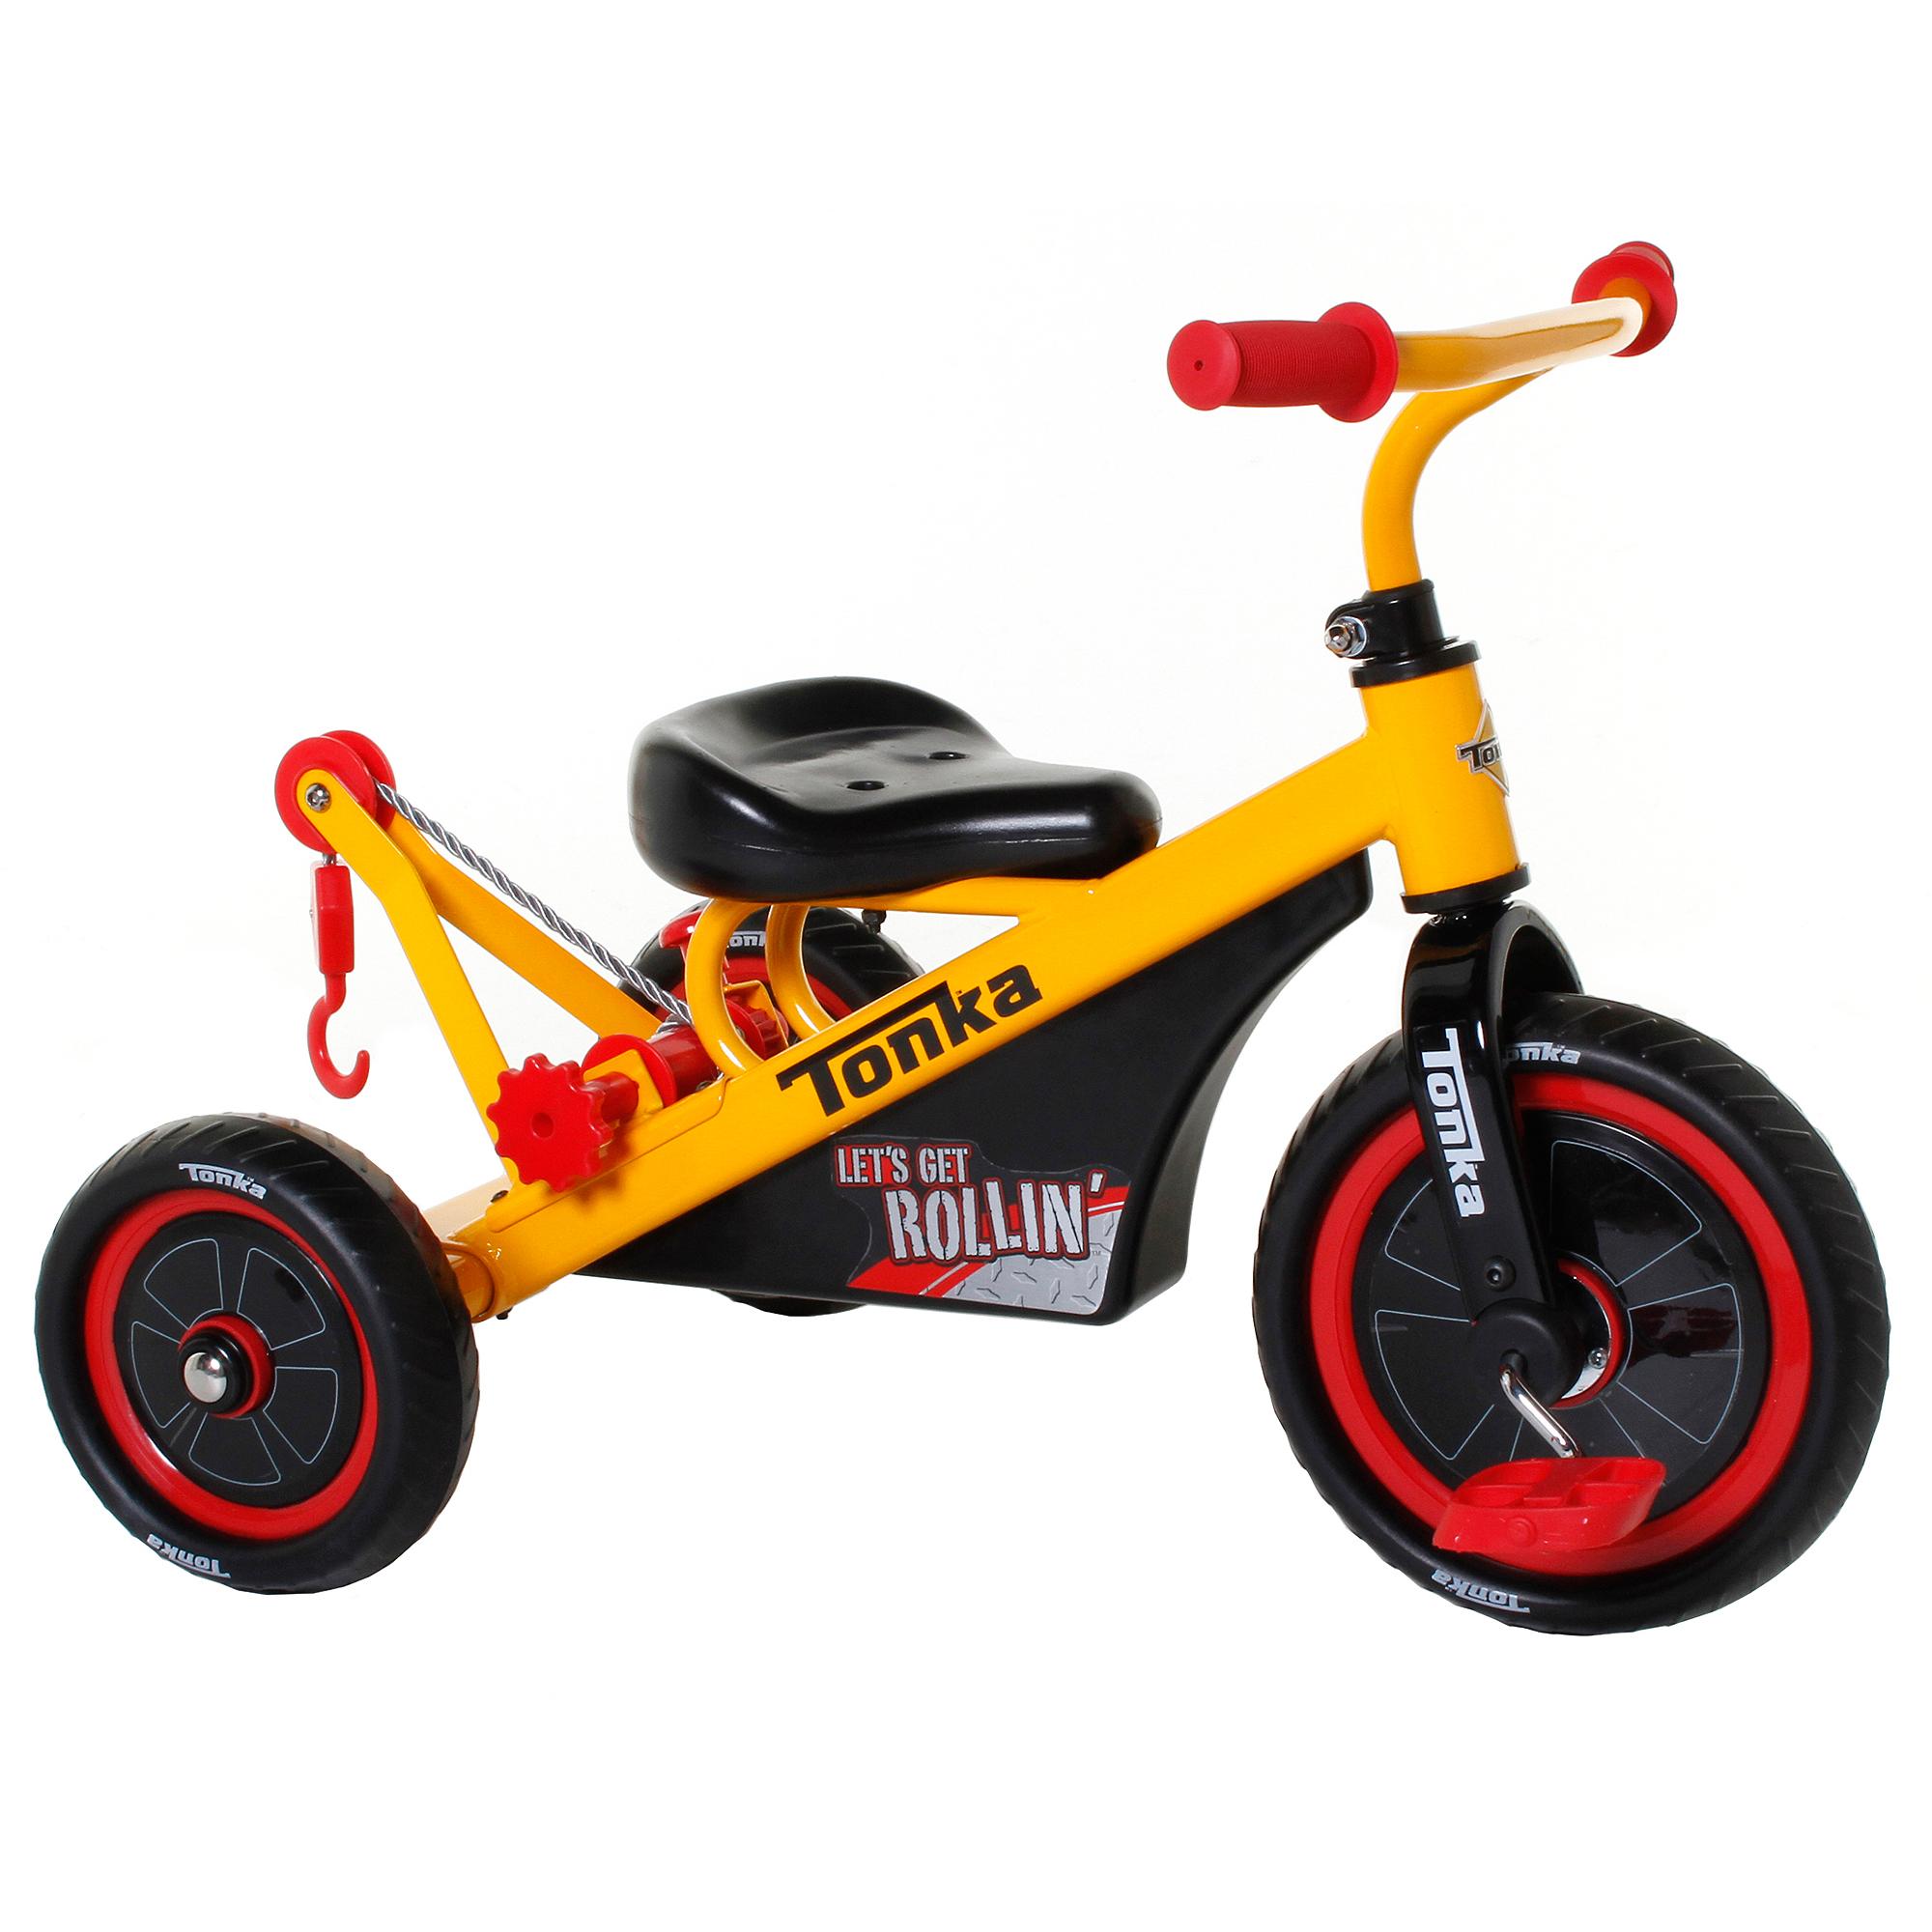 Tonka Boys' Trike, Yellow